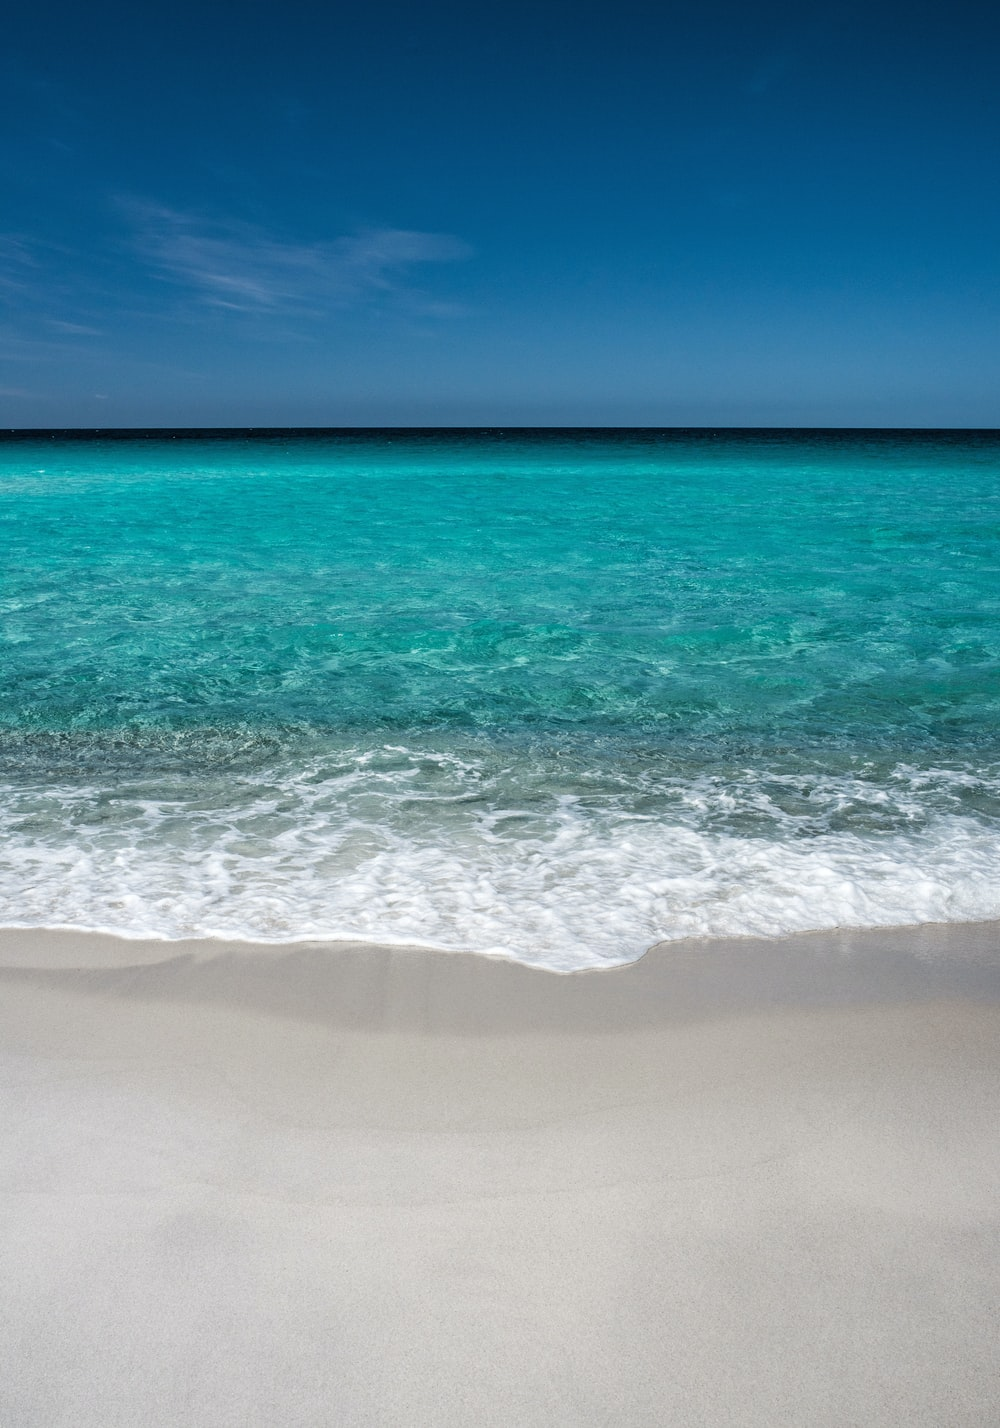 calm green sea under blue sky